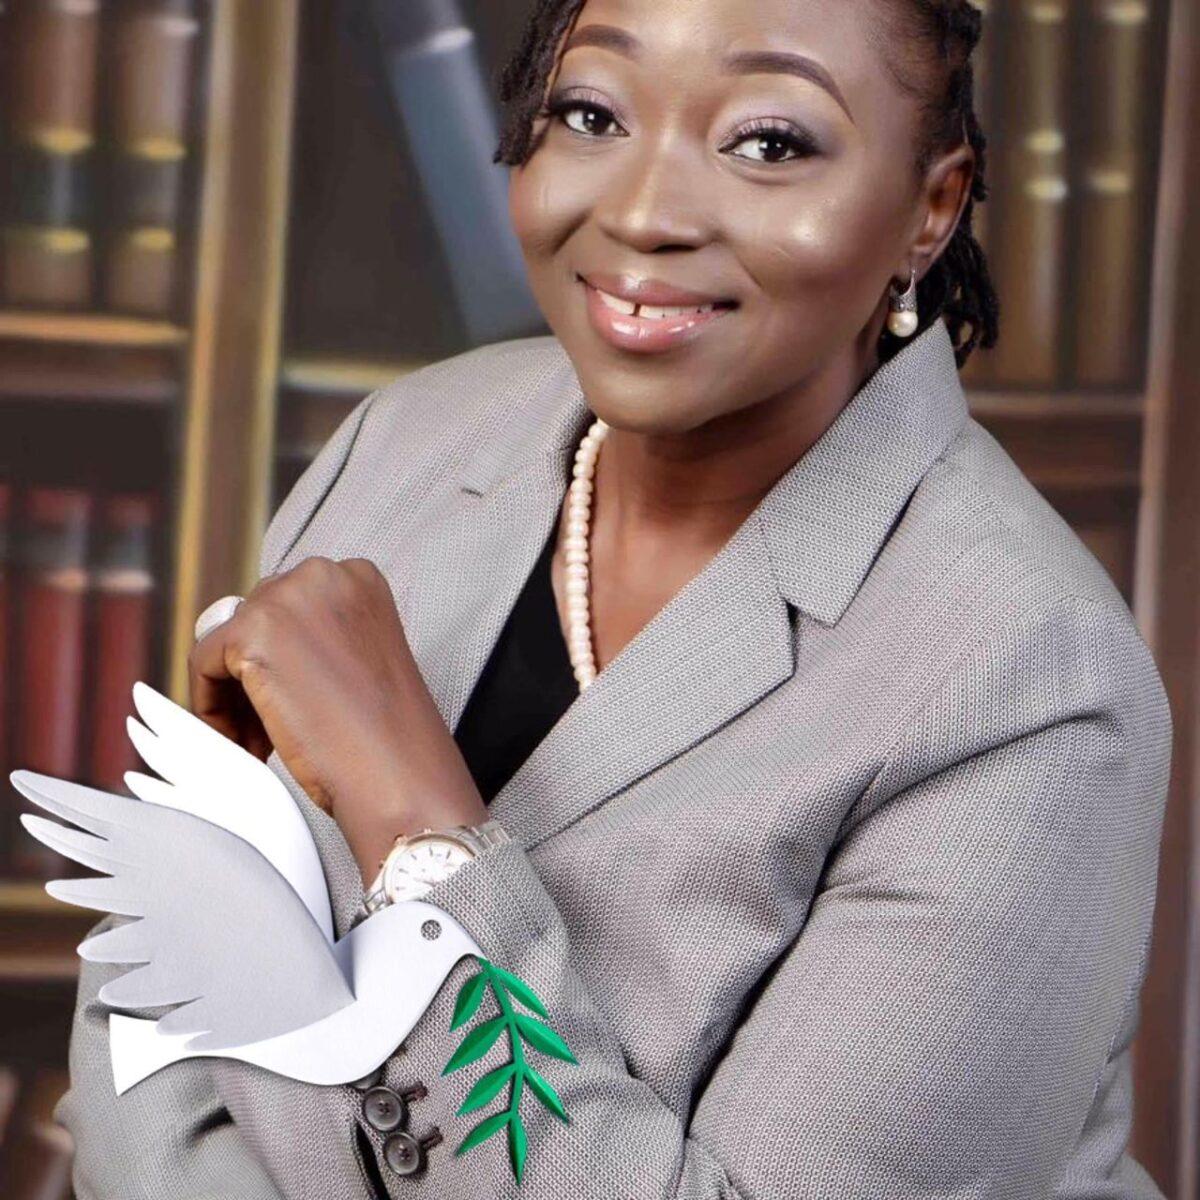 FIDA Nigeria Mourns the Passing of a Great FIDA Amazon DR. HAUWA EVELYN SHEKARAU